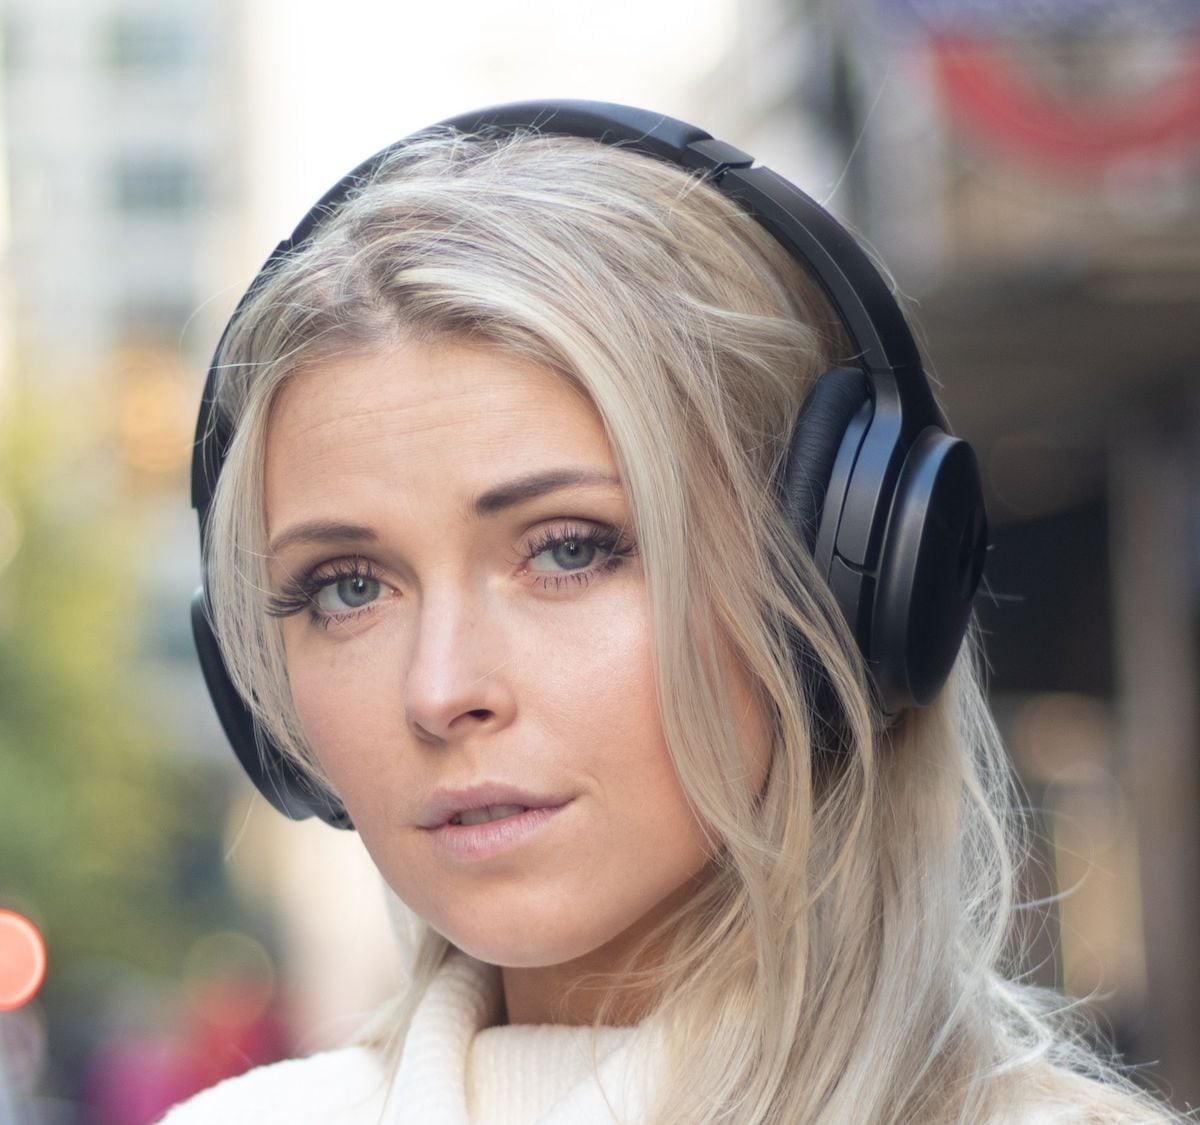 COWIN SE7 Bluetooth Wireless Headphones use professional ANC technology